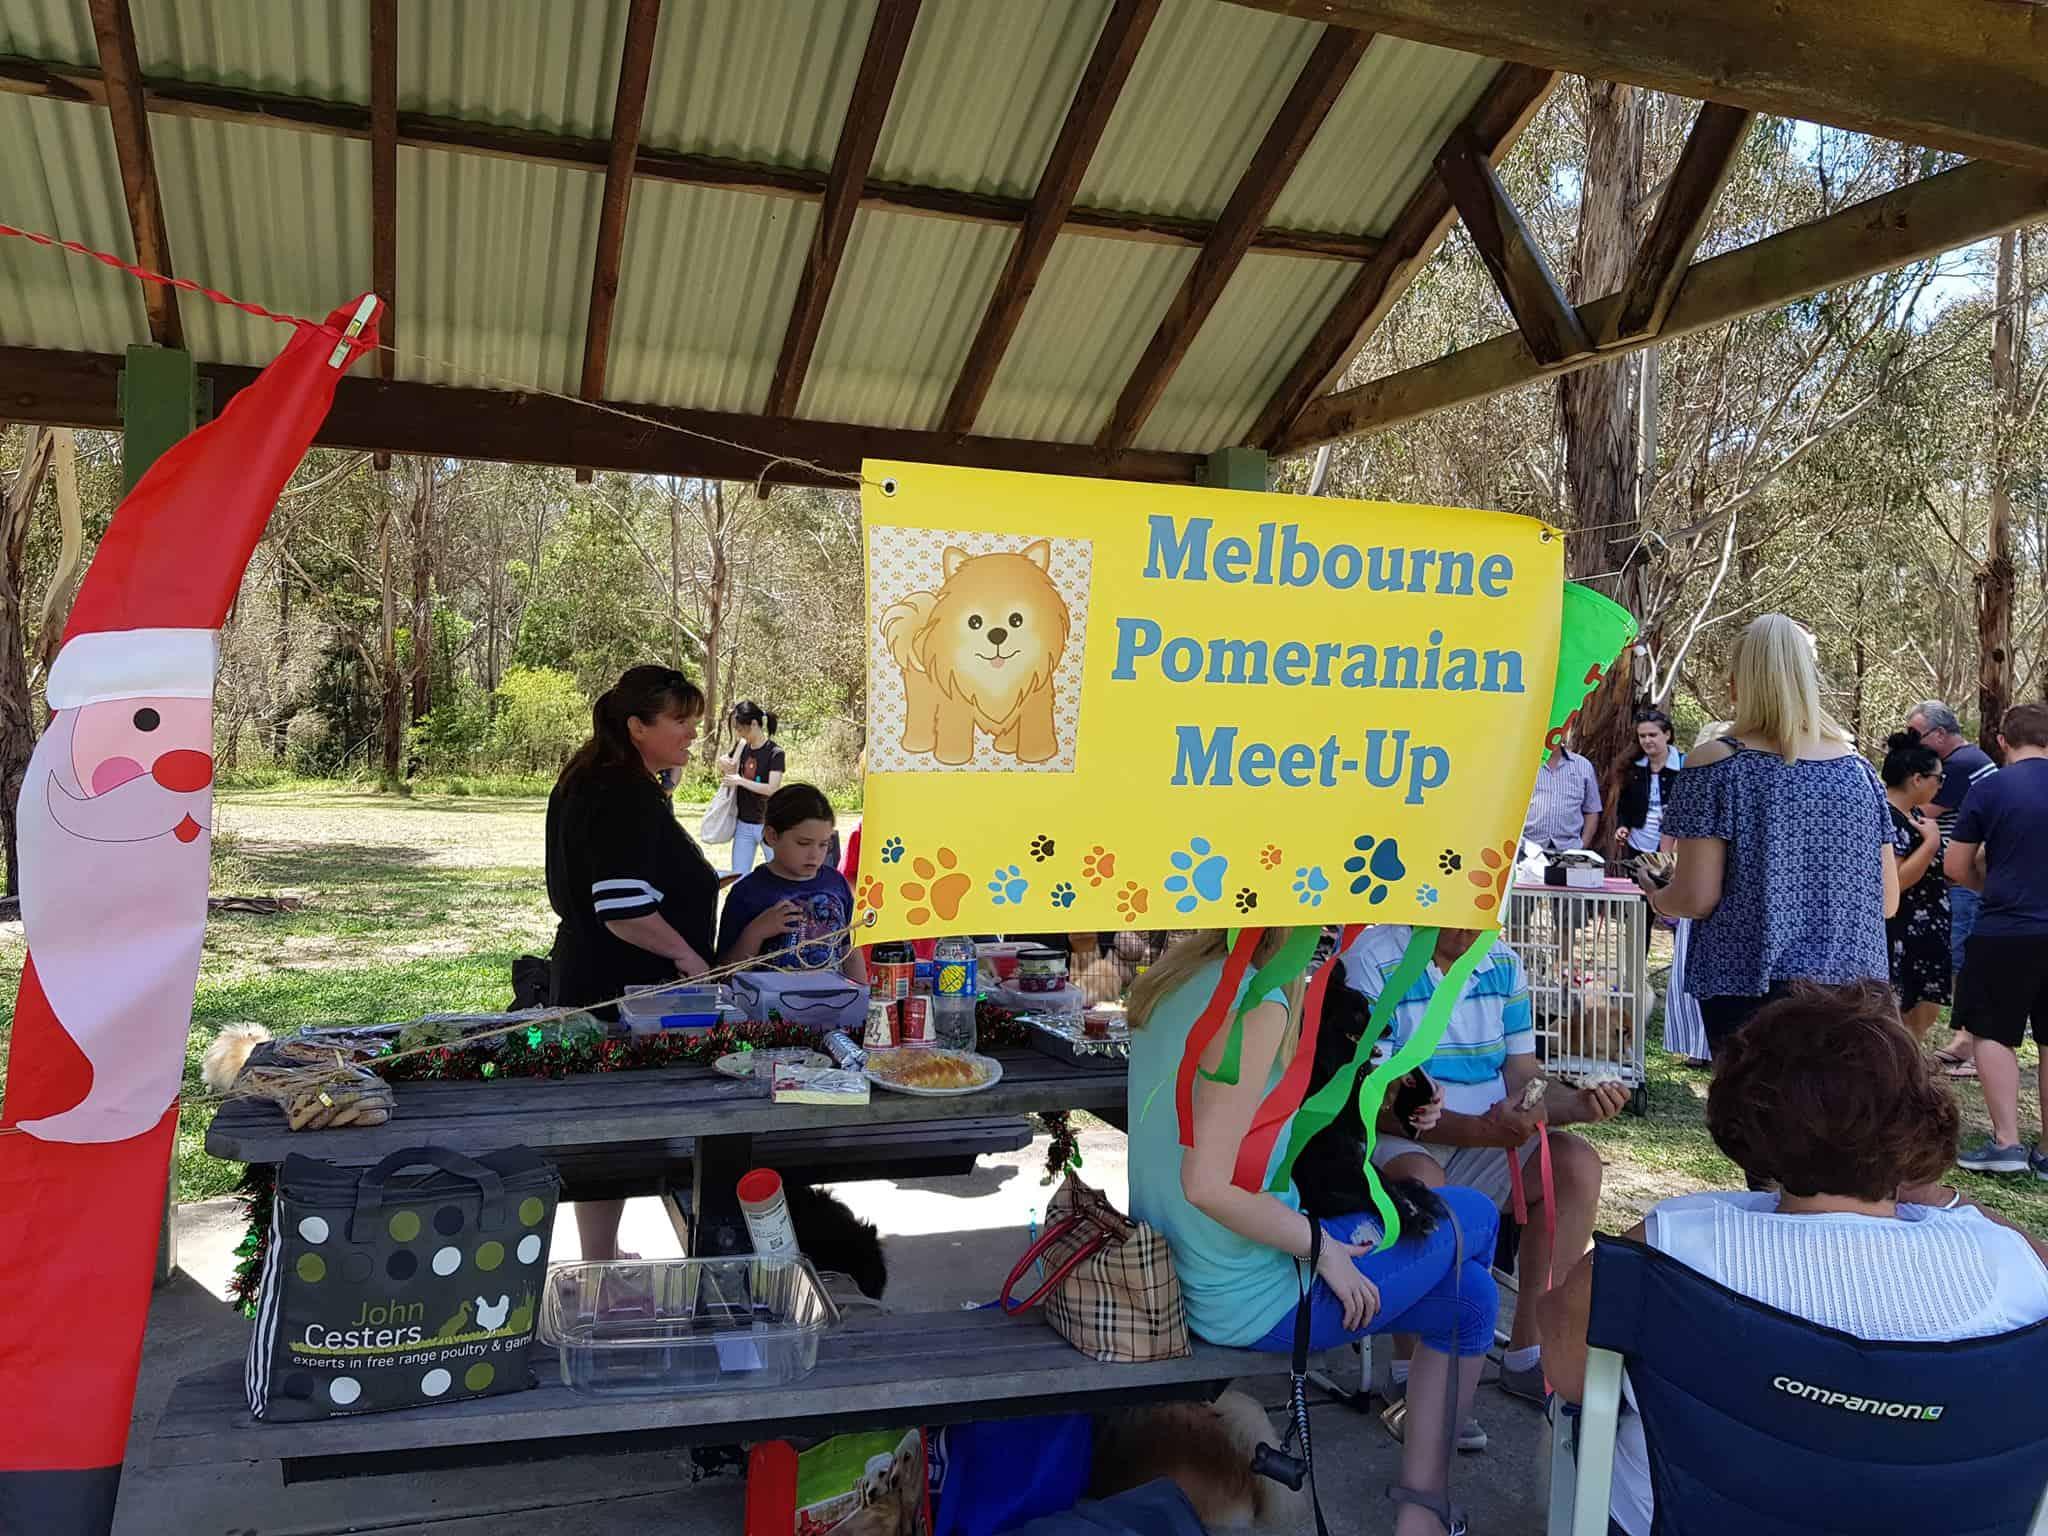 Melbourne Pomeranian Meet-Up/Christmas Party